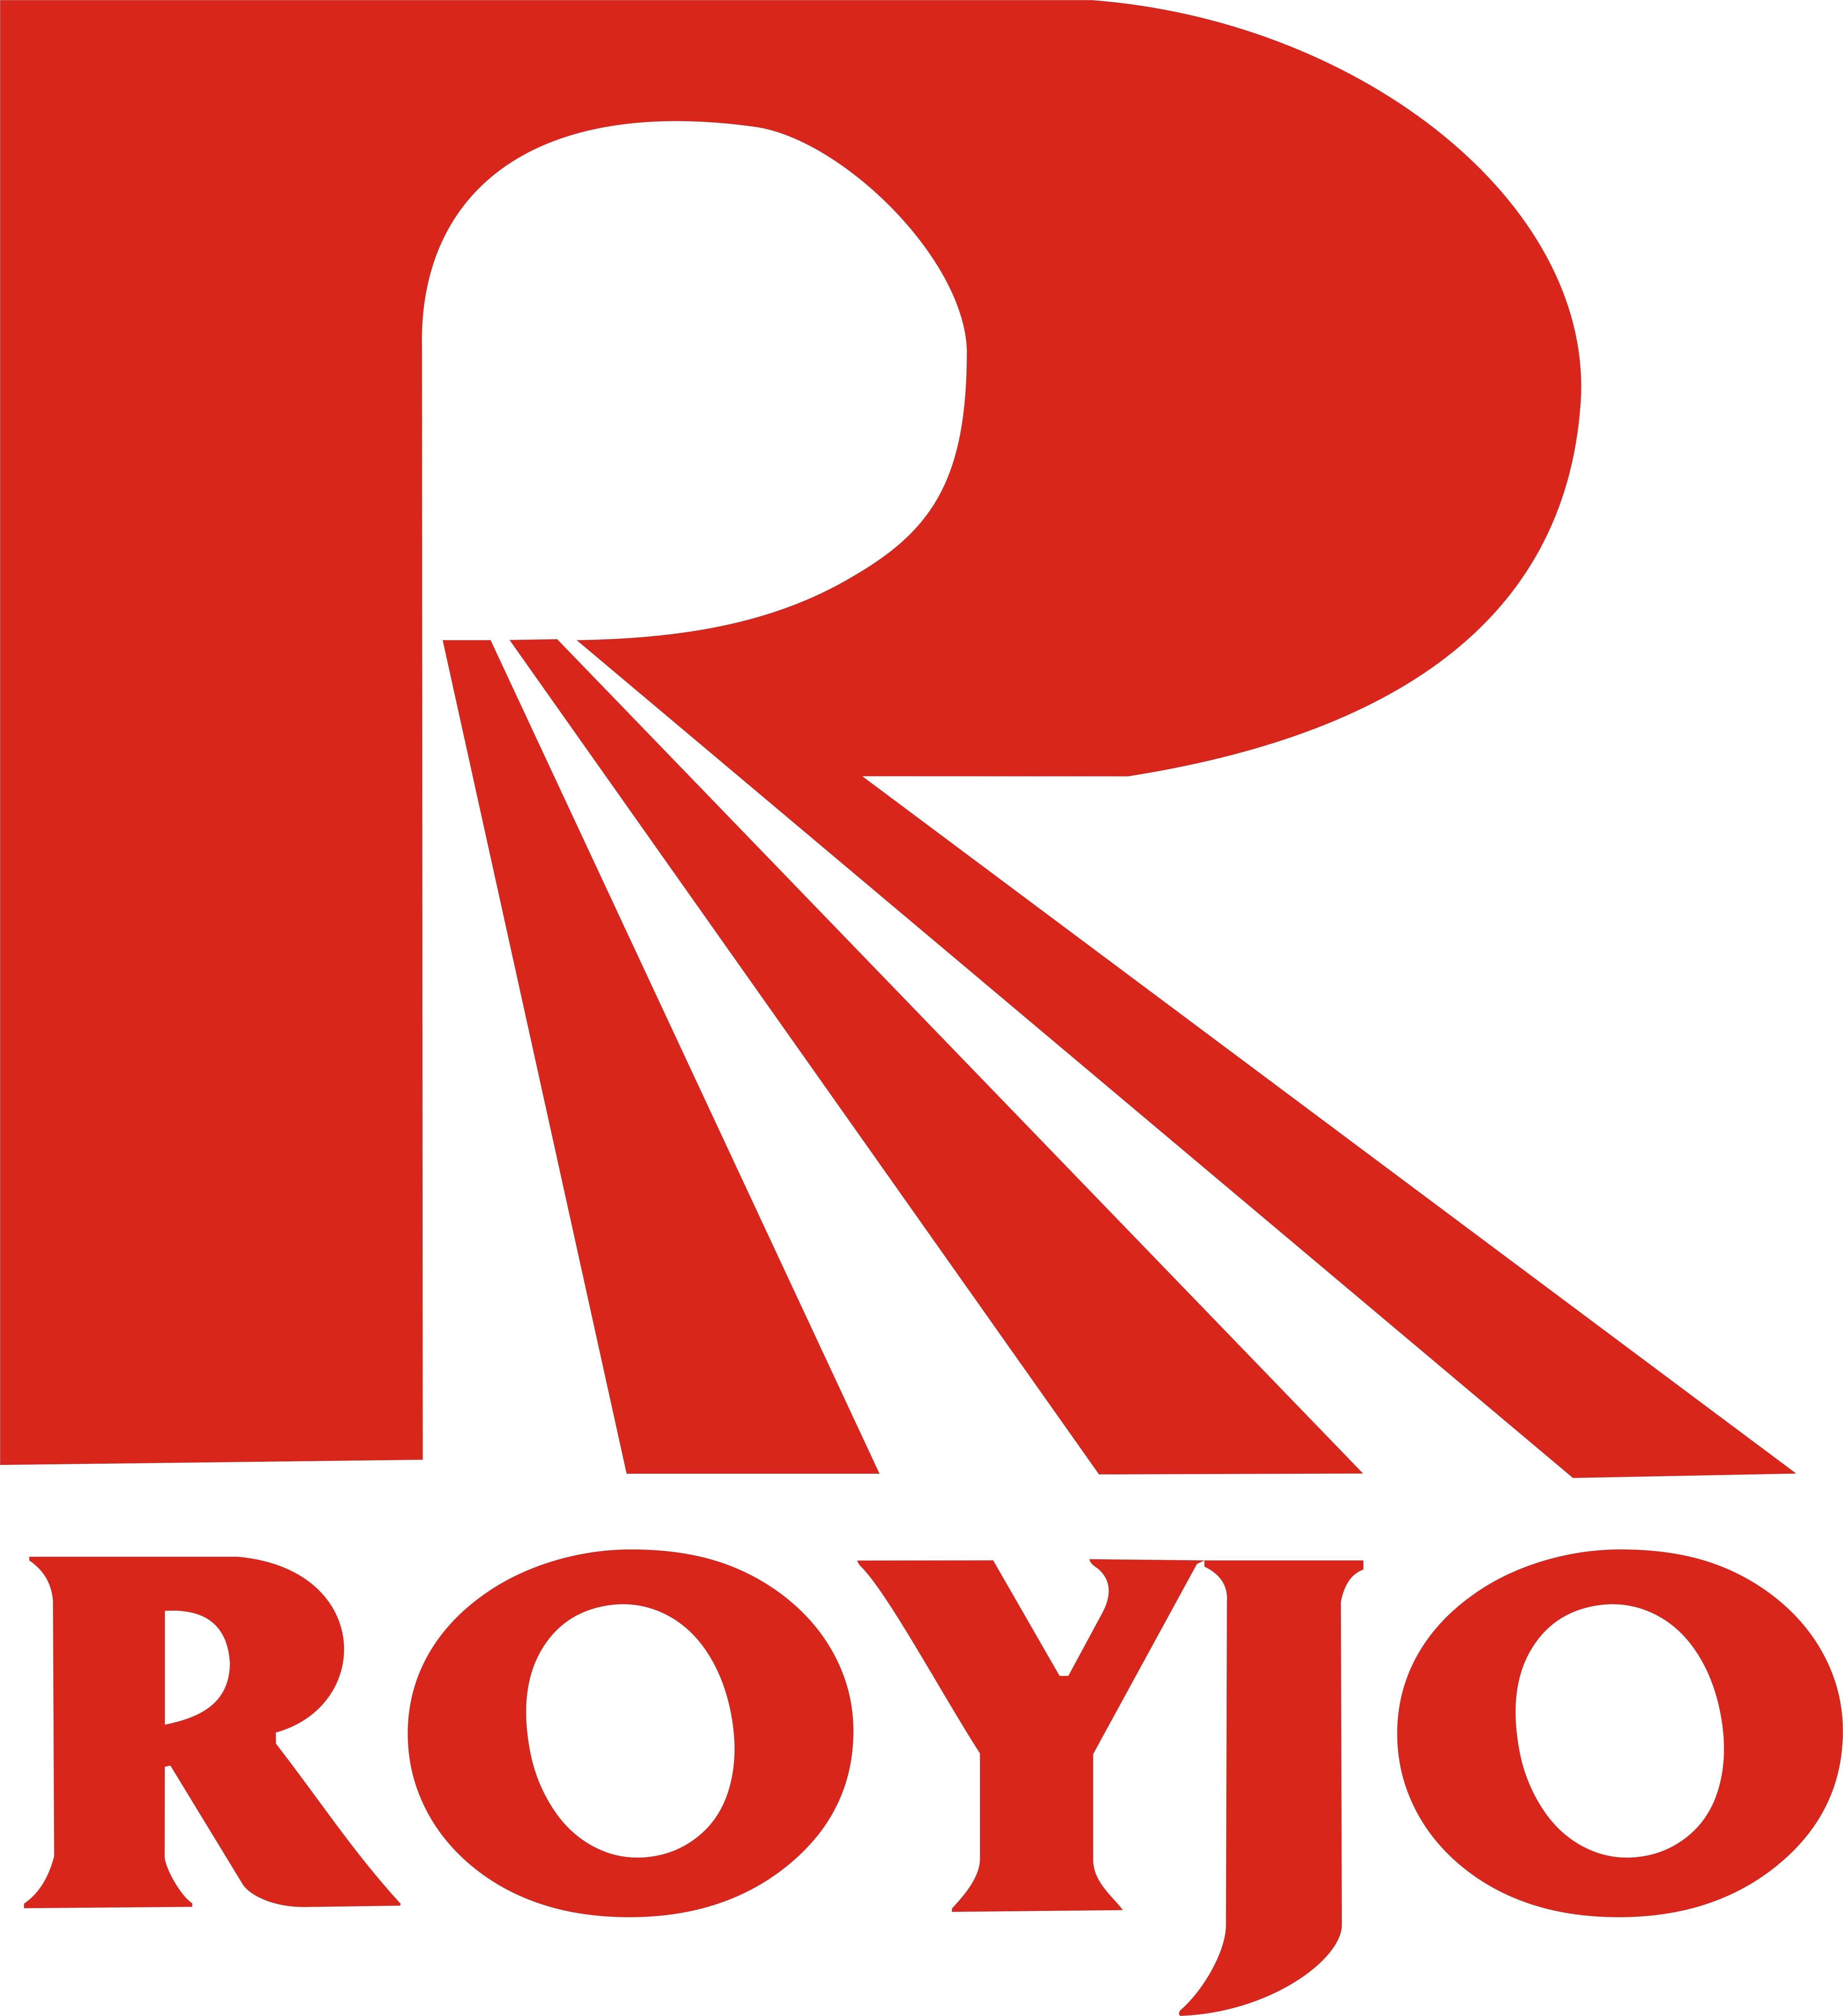 Distribuidora Royjo